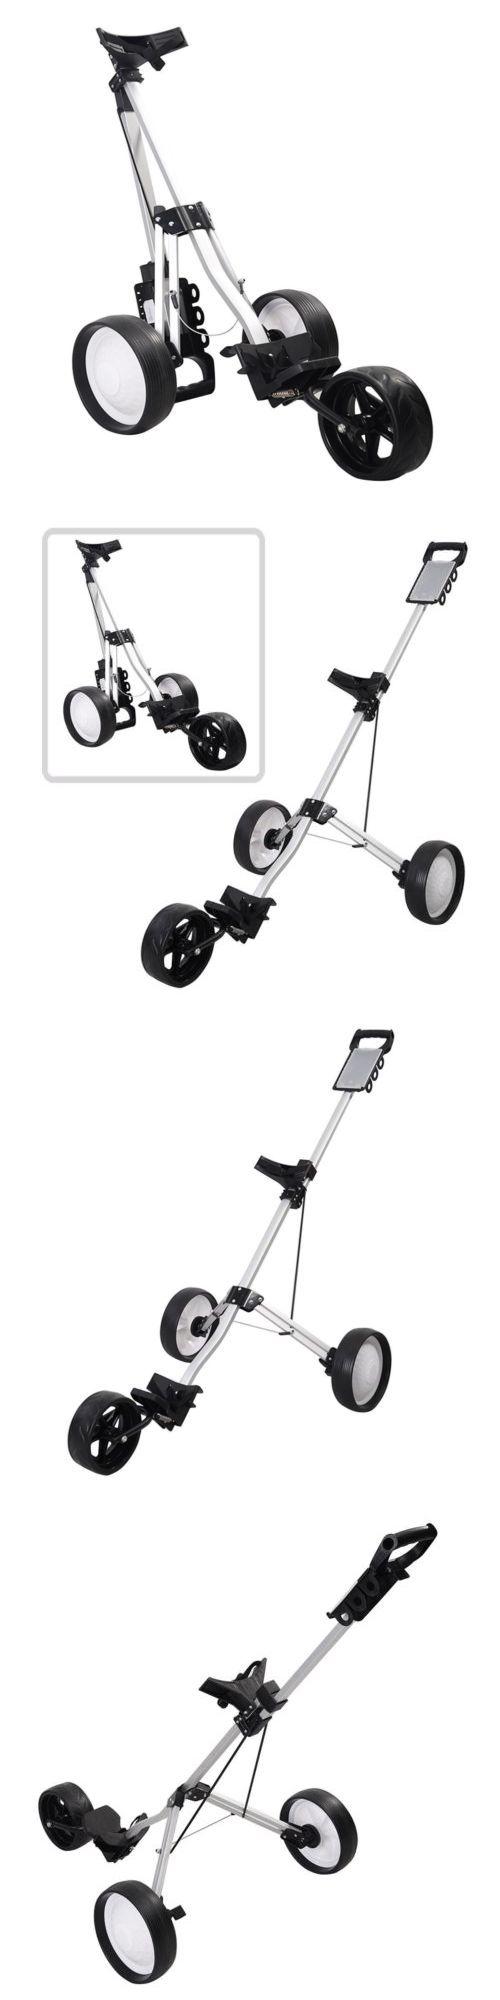 Push-Pull Golf Carts 75207: Foldable 3 Wheel Push Pull Golf Cart Folding Trolley Three Wheels Swivel New Hot -> BUY IT NOW ONLY: $53.69 on eBay!